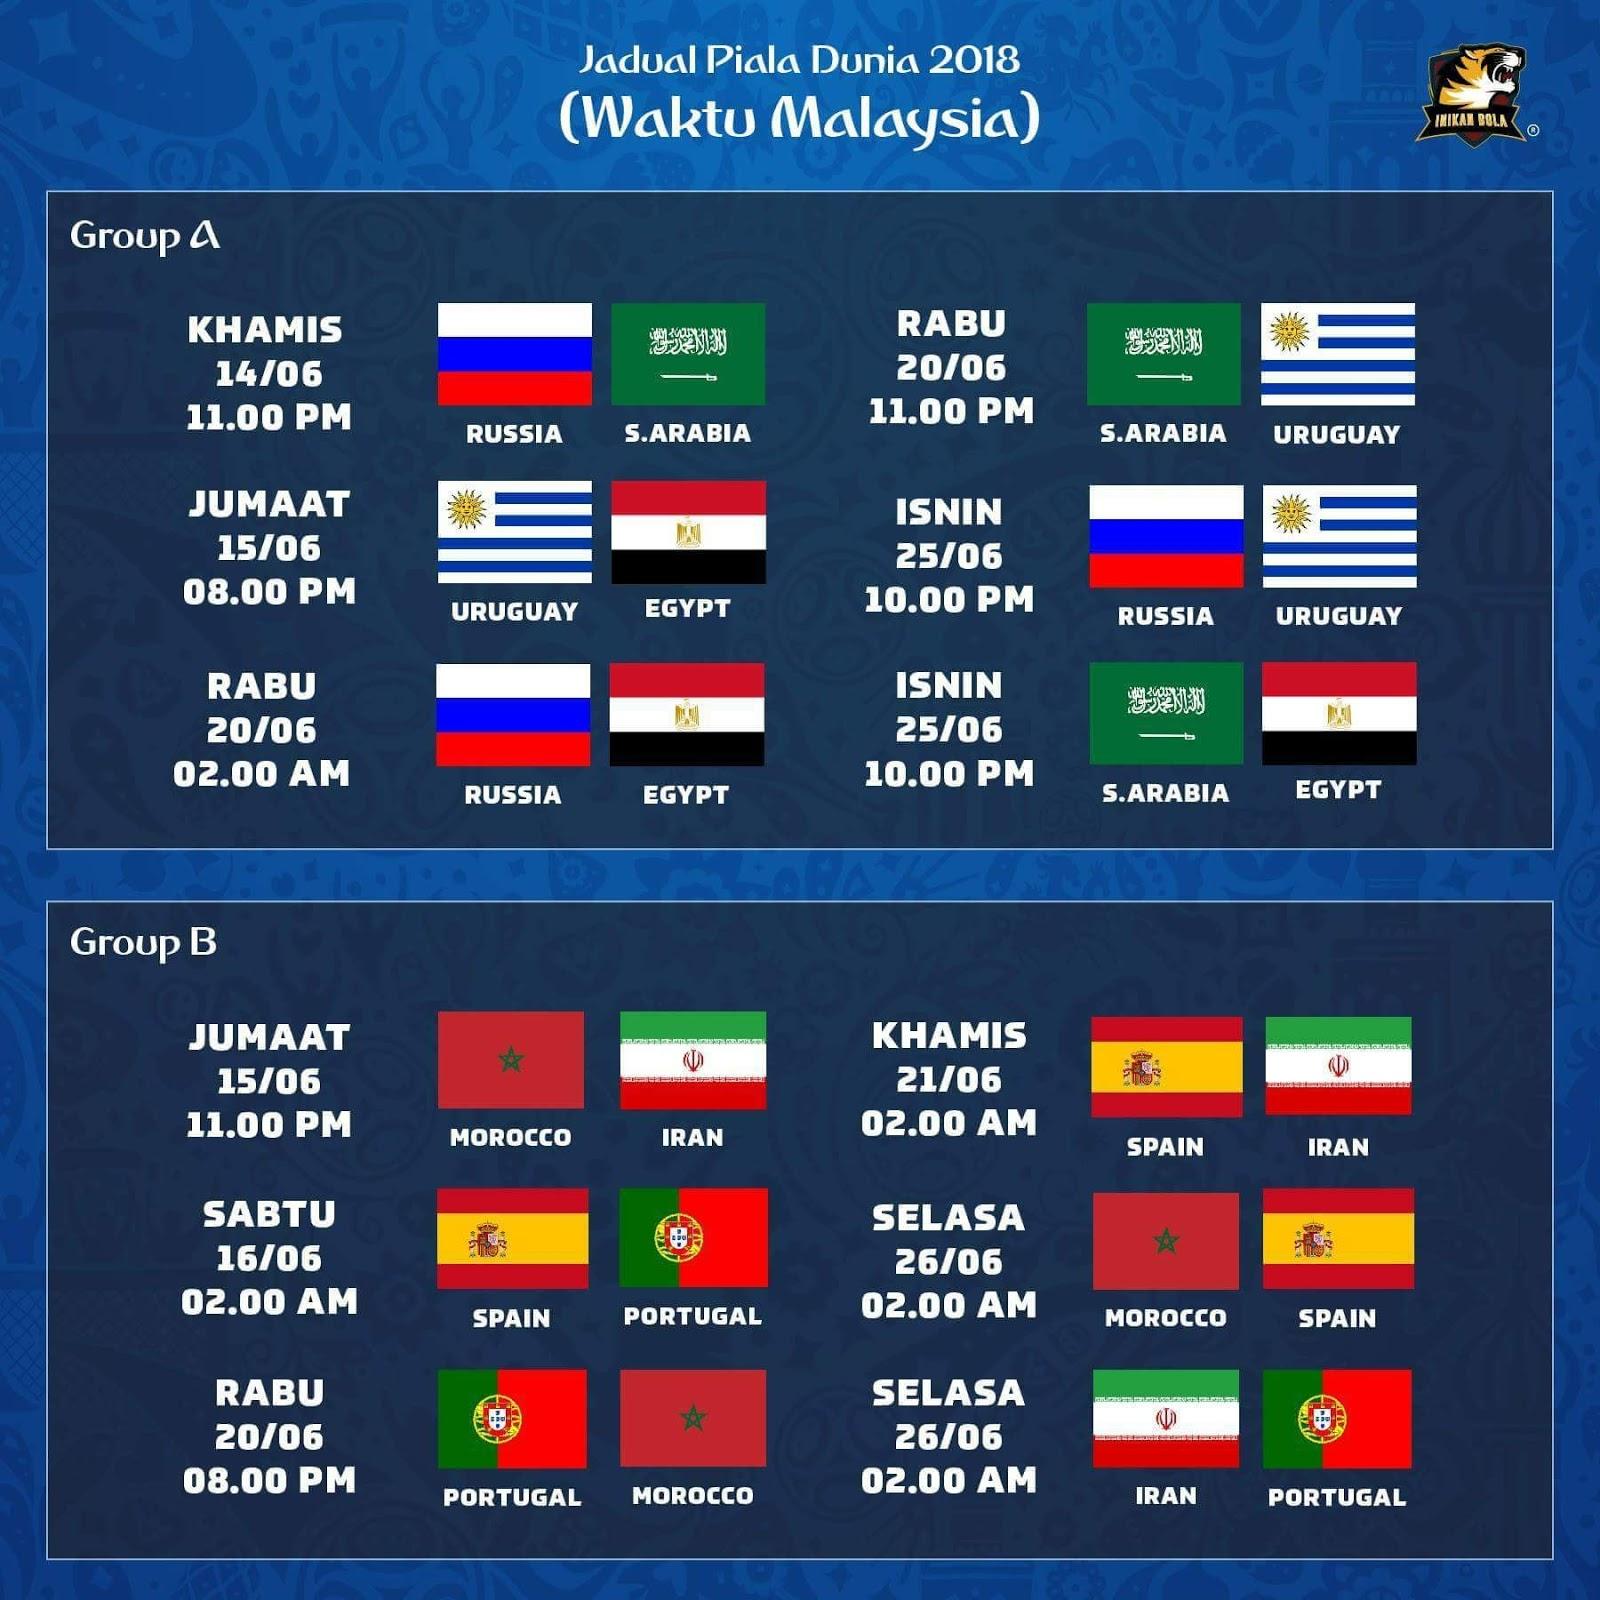 Ok Jom Tengok Jadual Perlawanan Piala Dunia Russia  Dan Perlawanan Yang Bakal Ditayangkan Di Rtm  Dan Di Stadium Astro